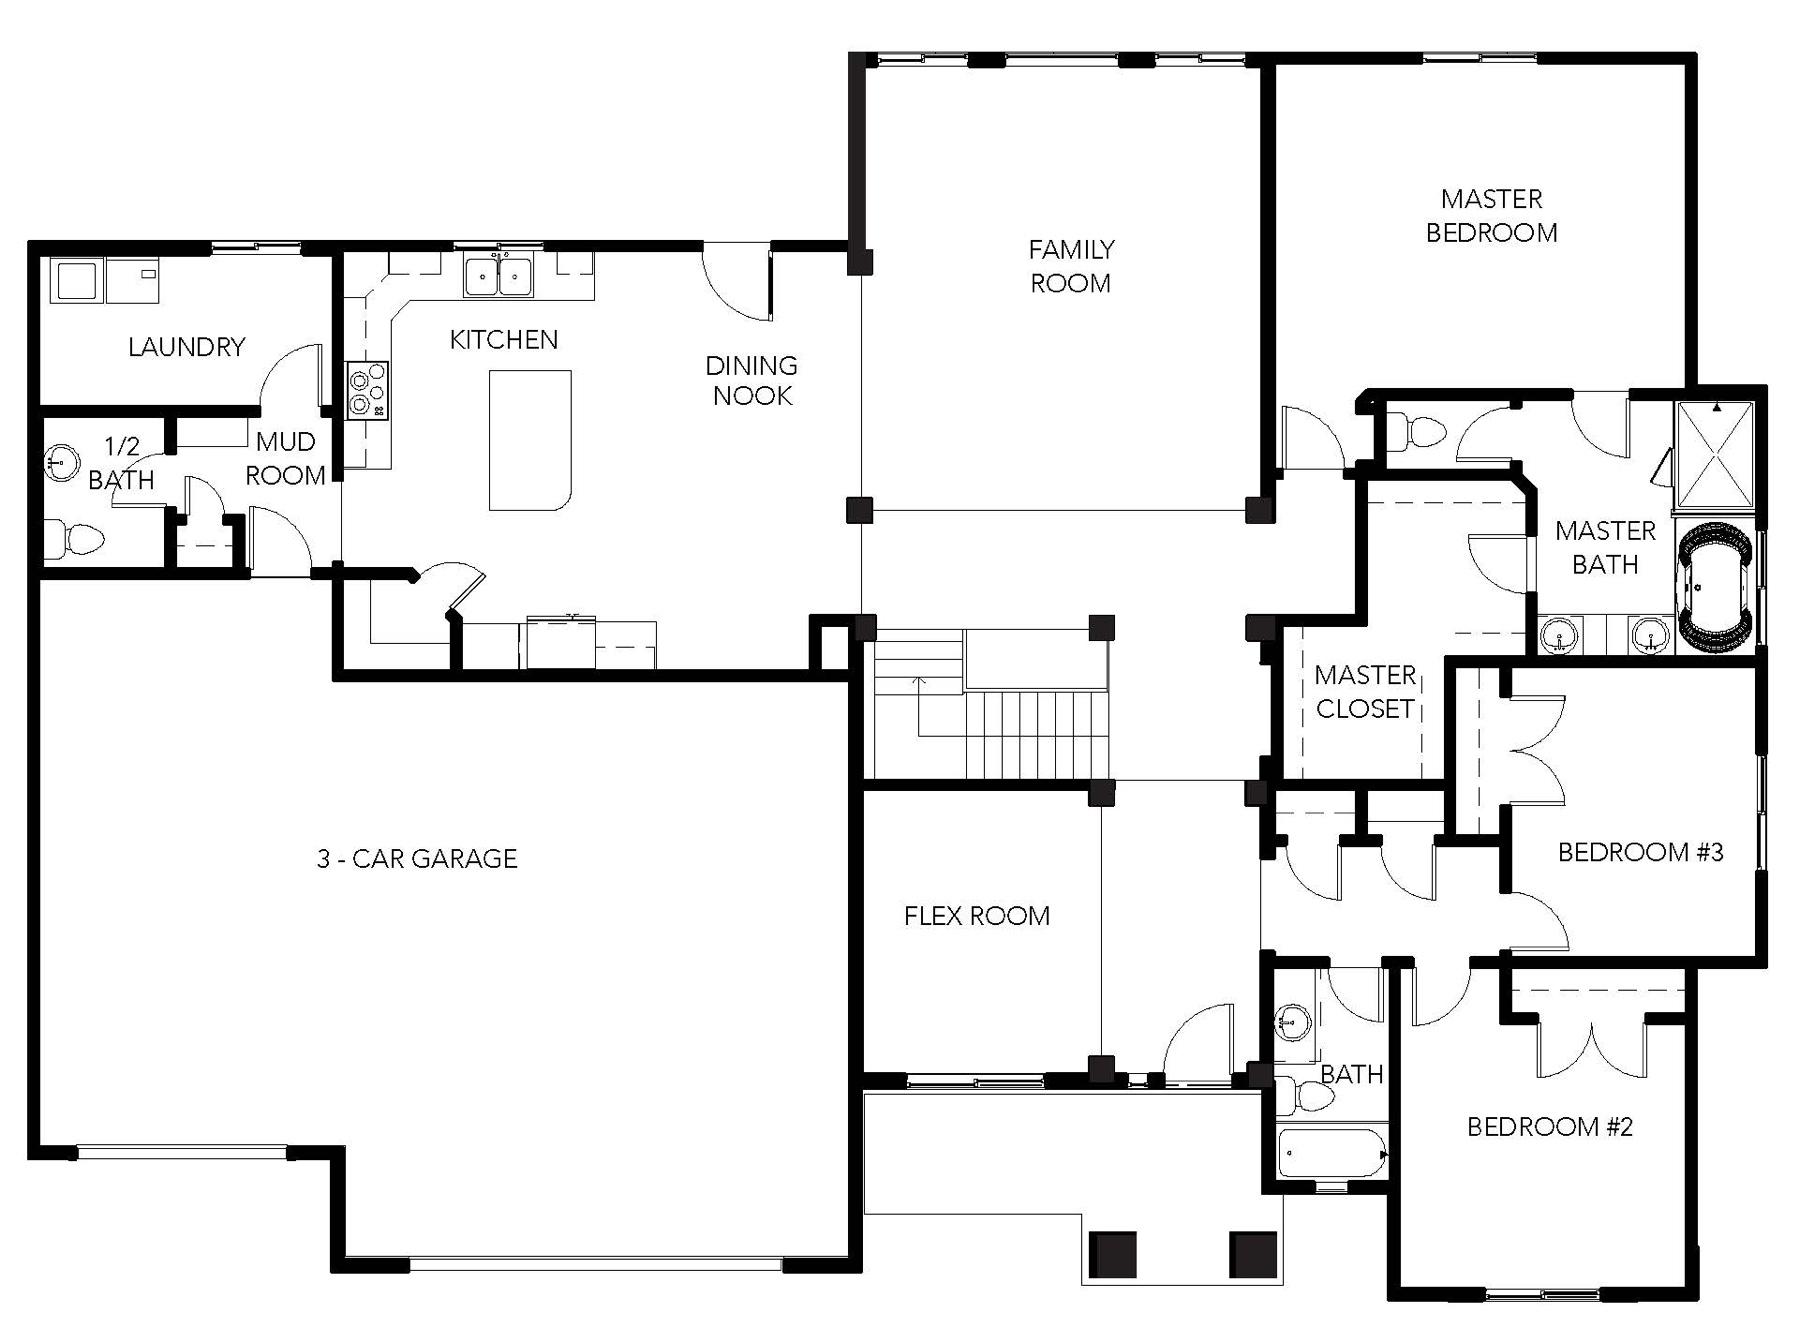 tapestry home design